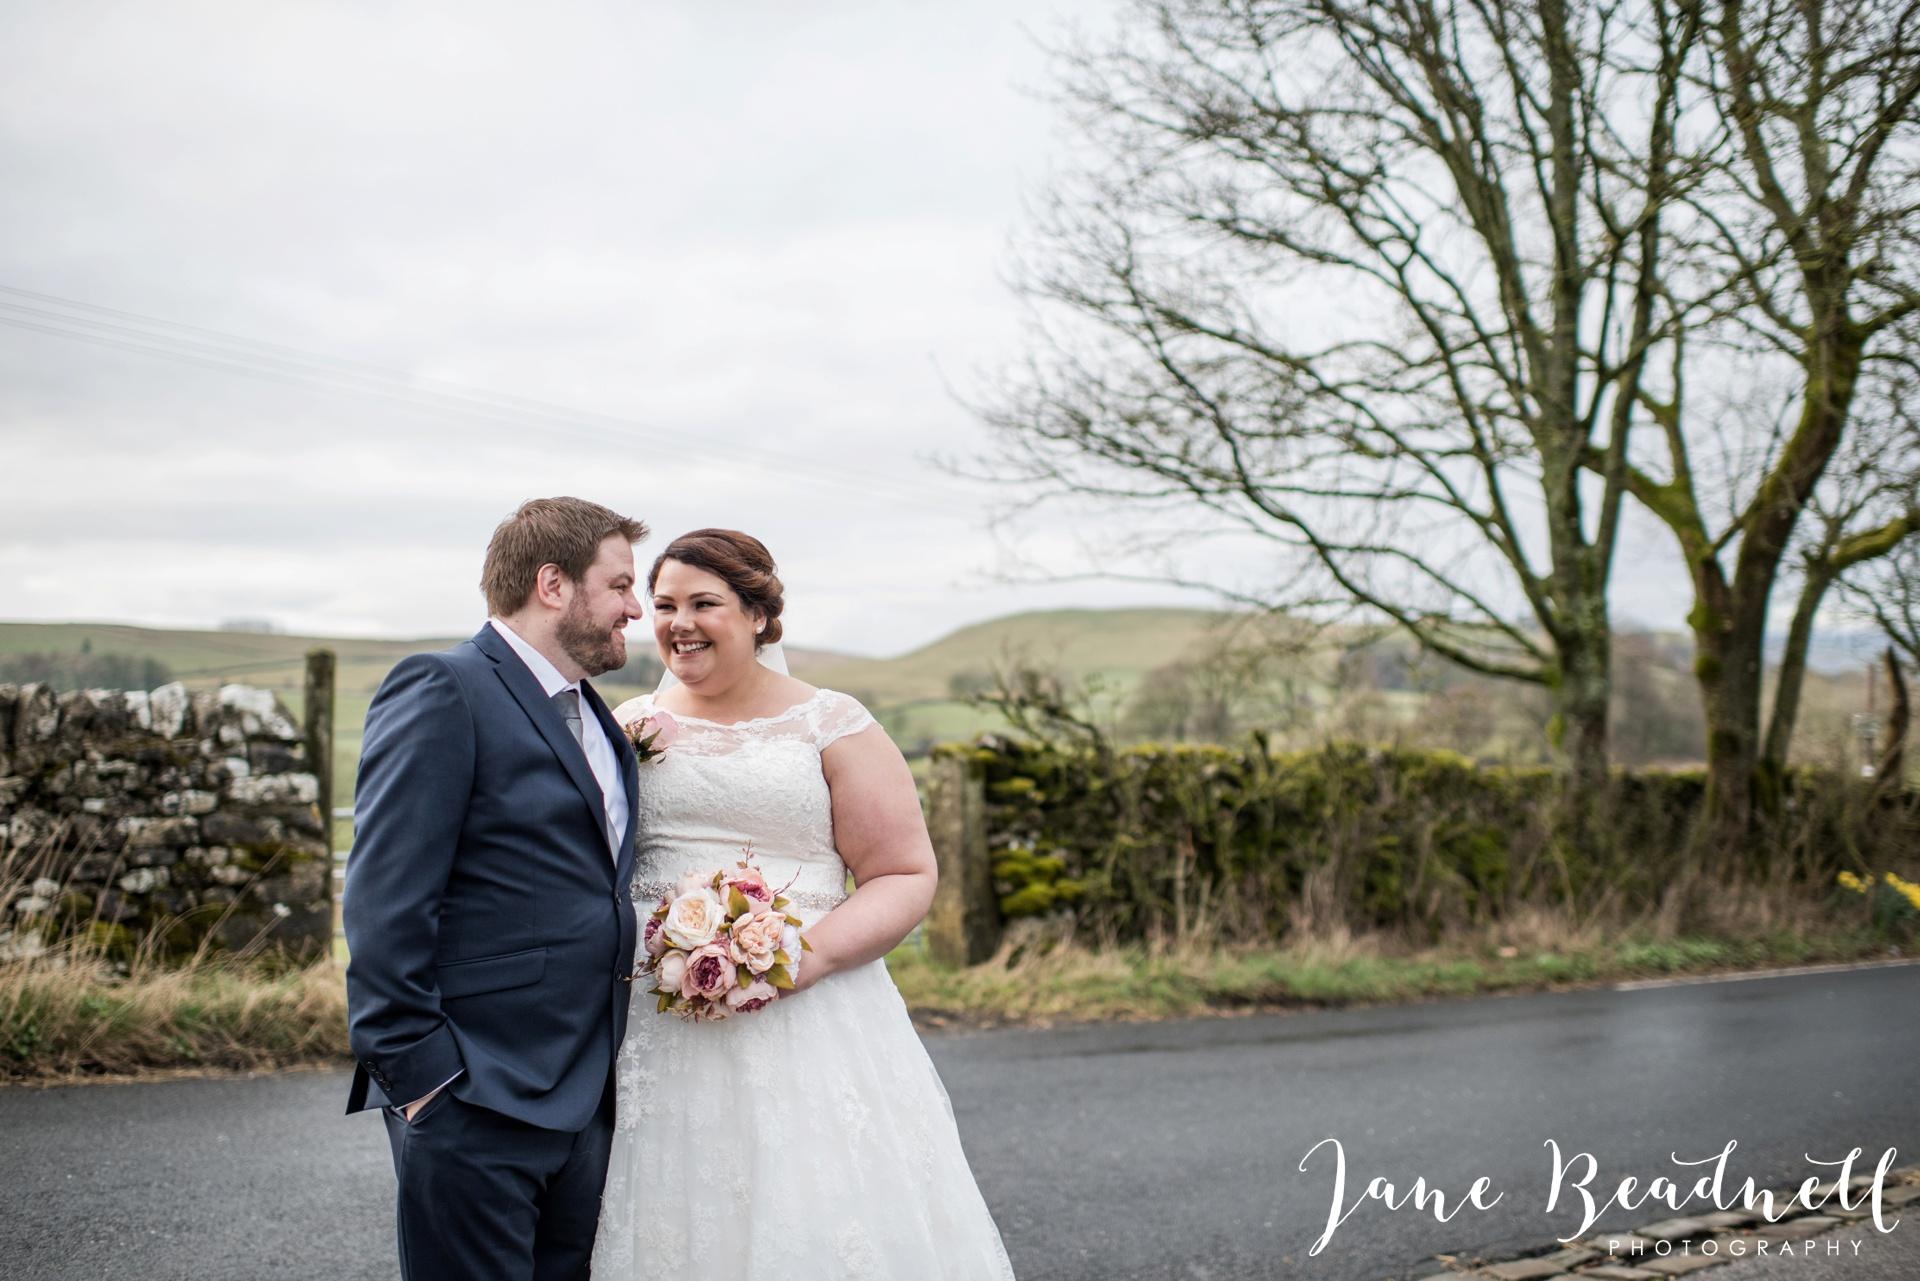 Fine art wedding photography jane beadnell photography Cracoe Village Hall Yorkshire_0006